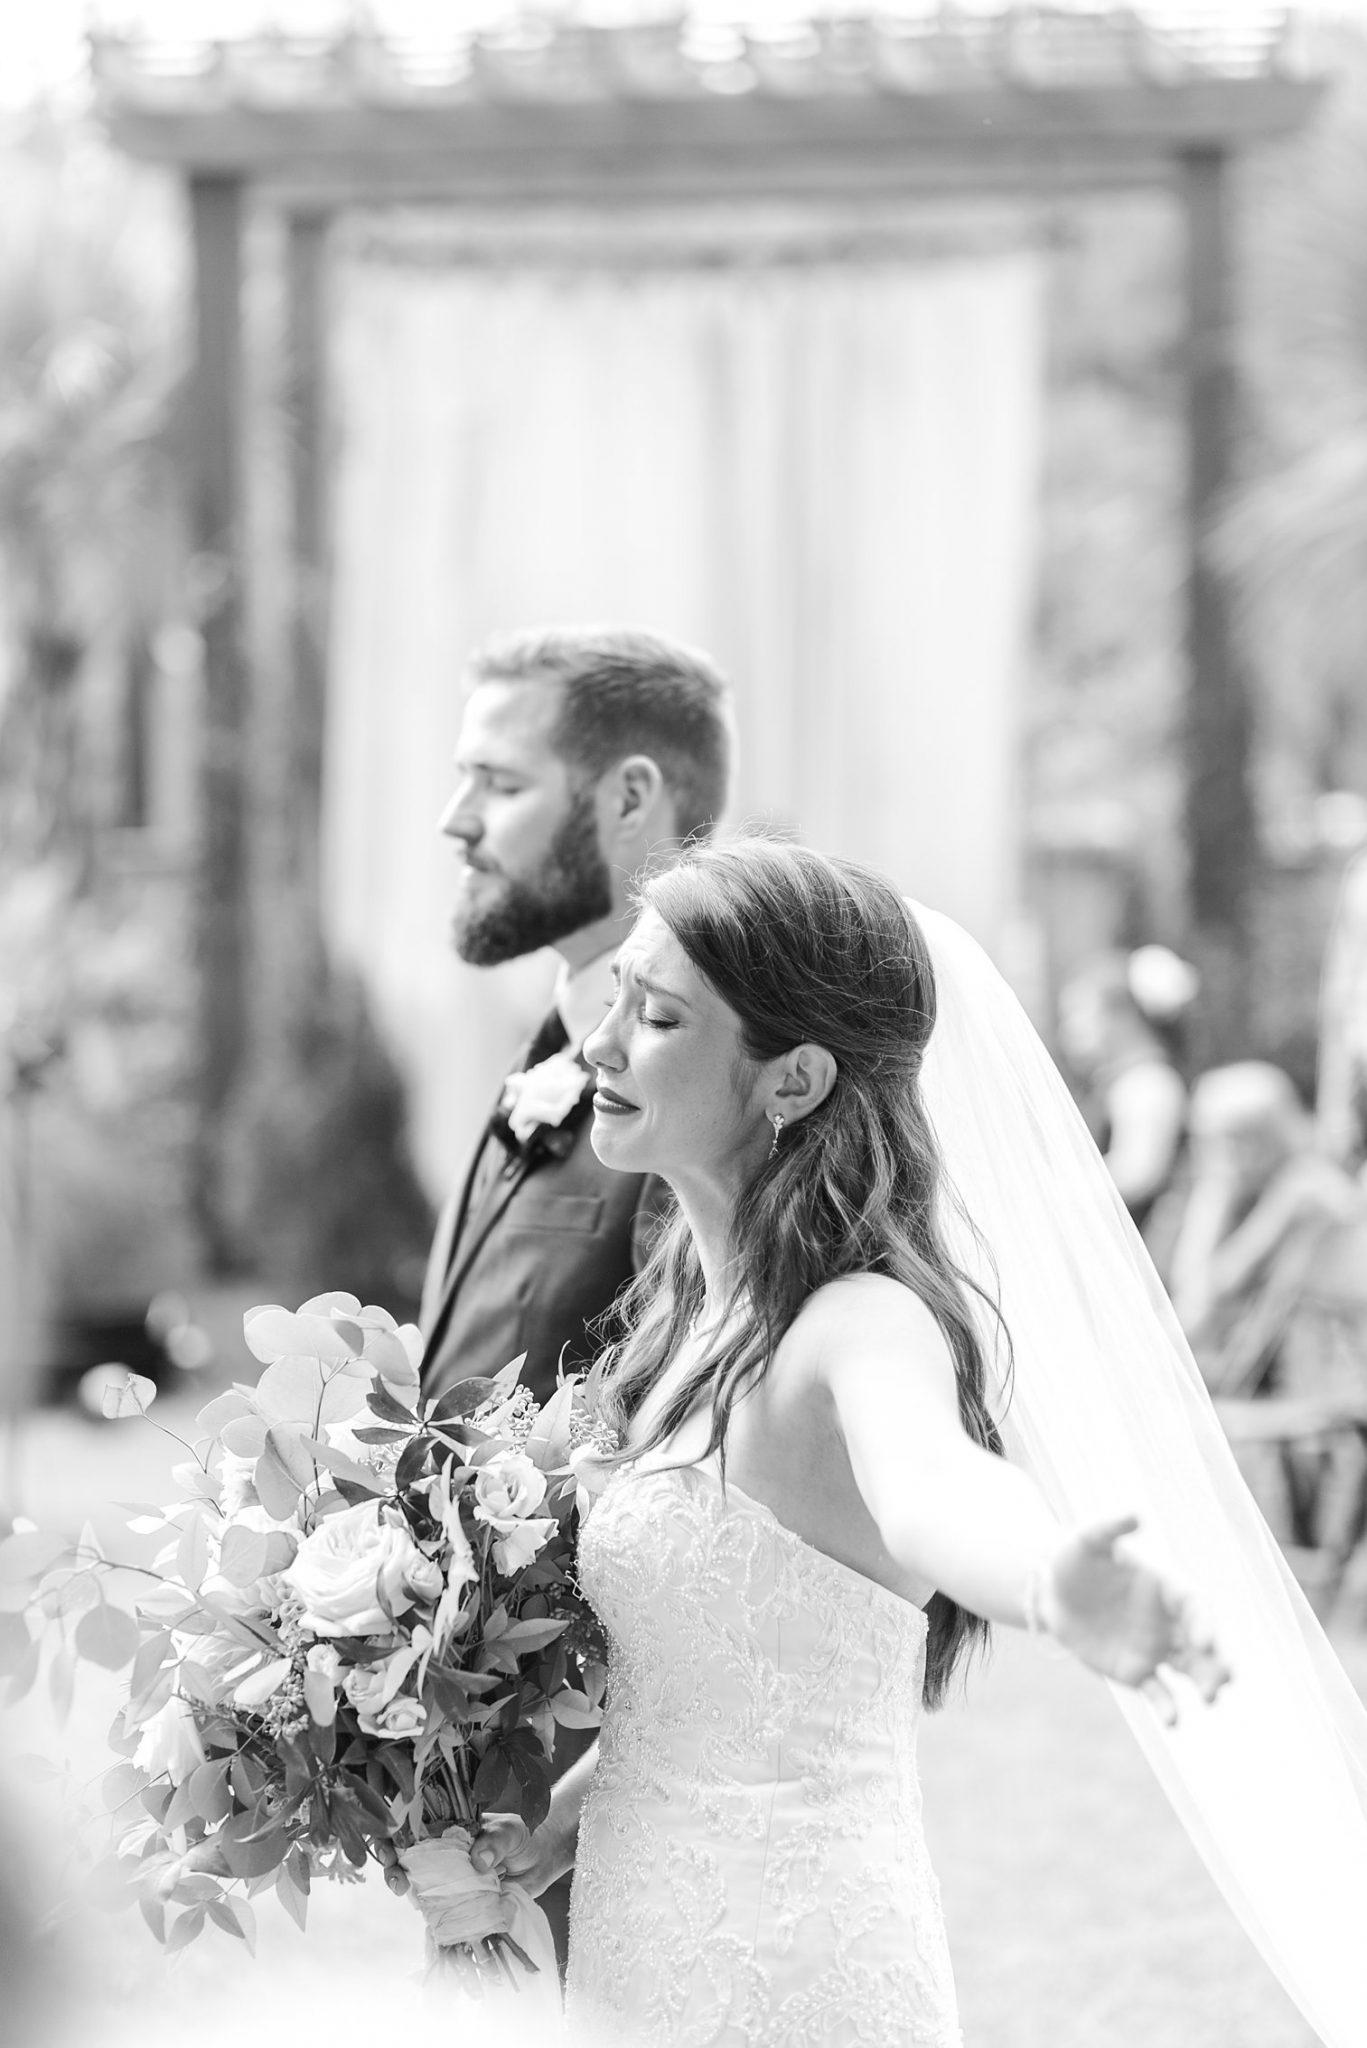 christian weddings-religious wedding ceremony-worship-wedding day-bride and groom